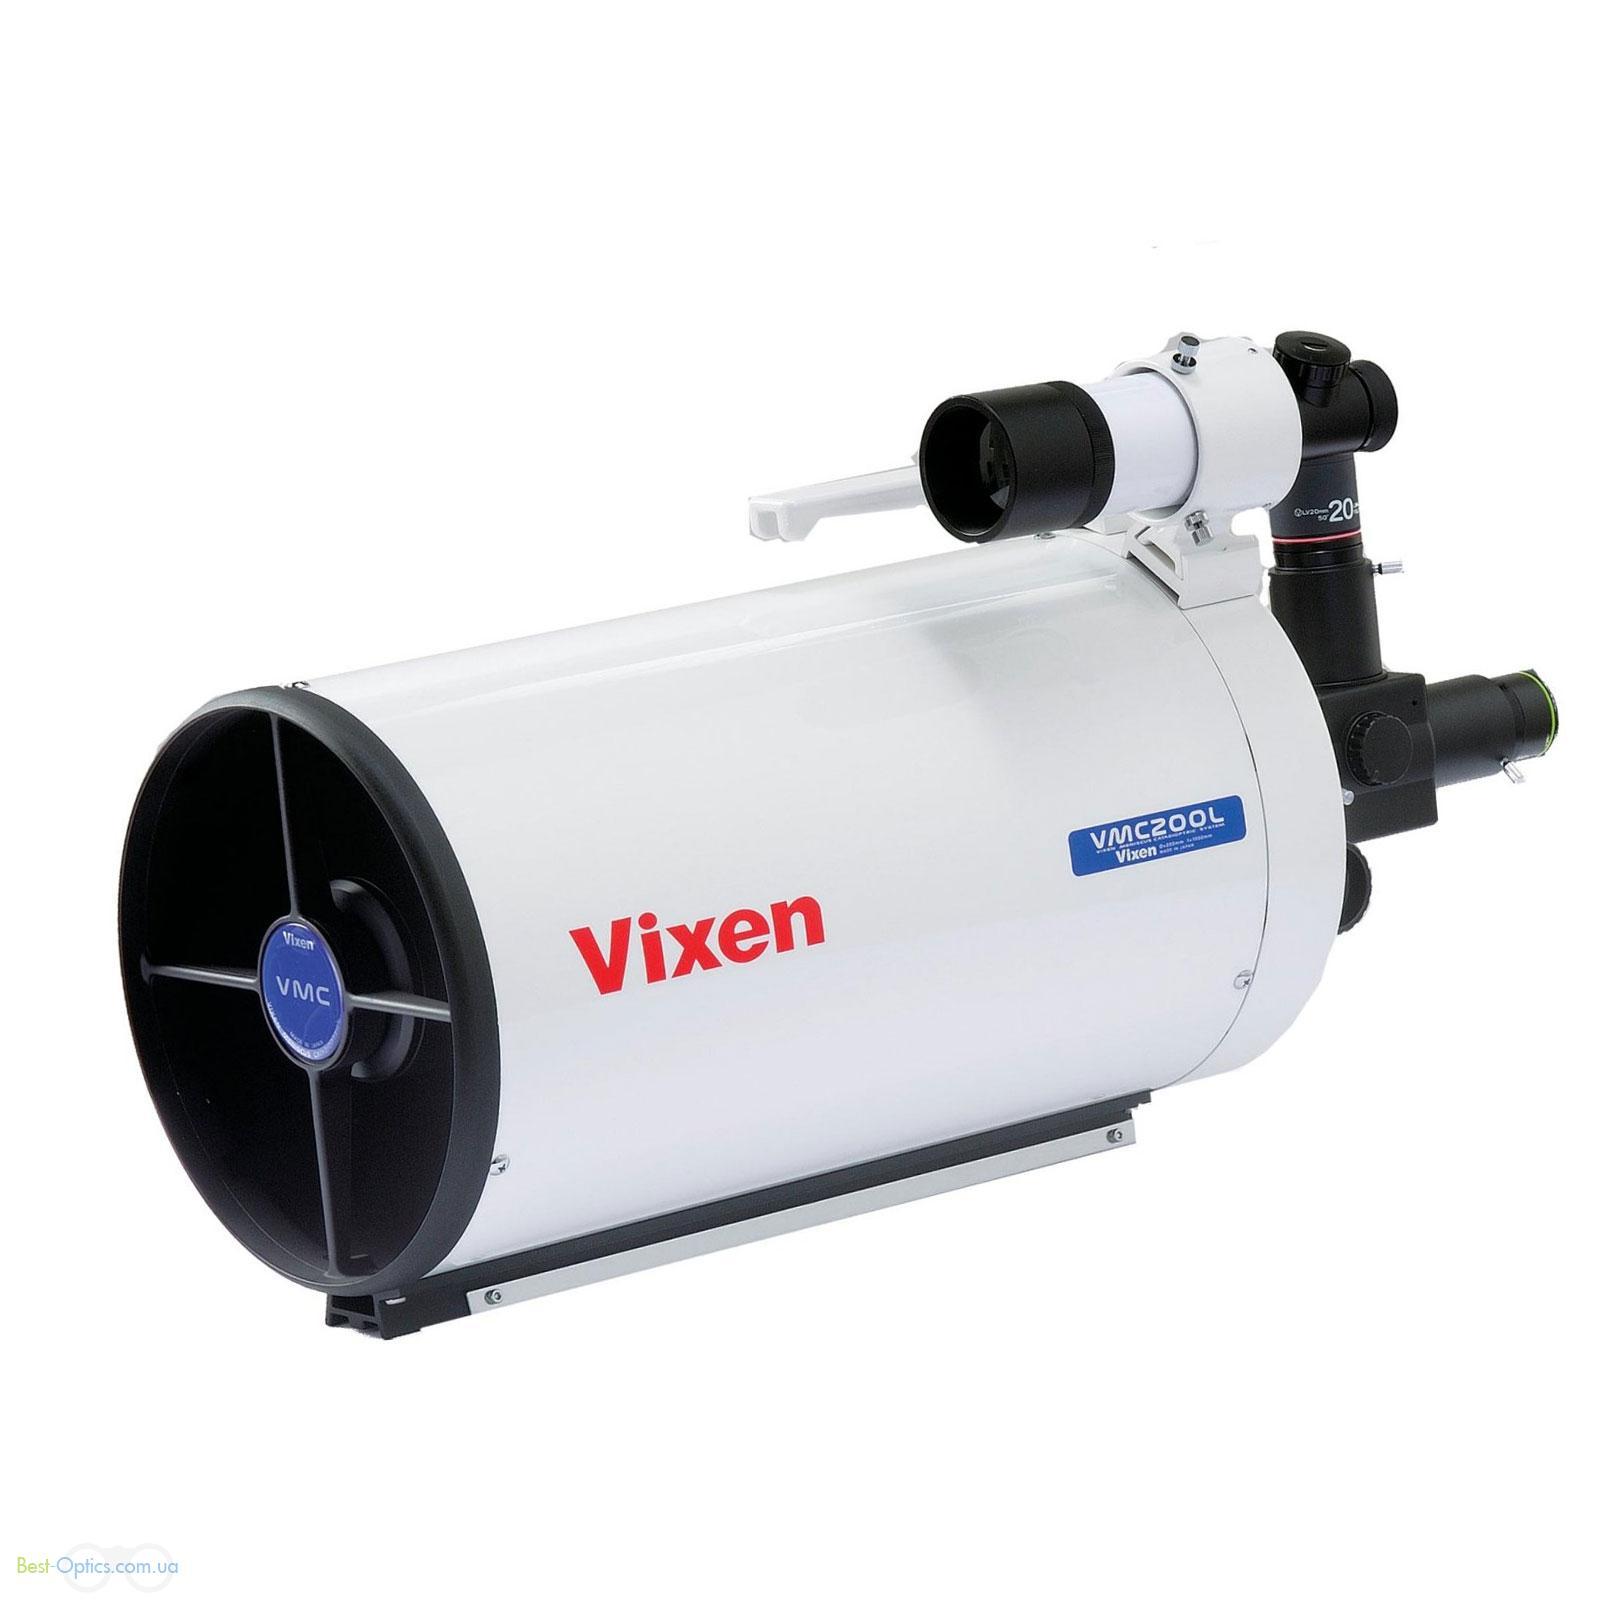 Телескоп Vixen VMC 200L OTA